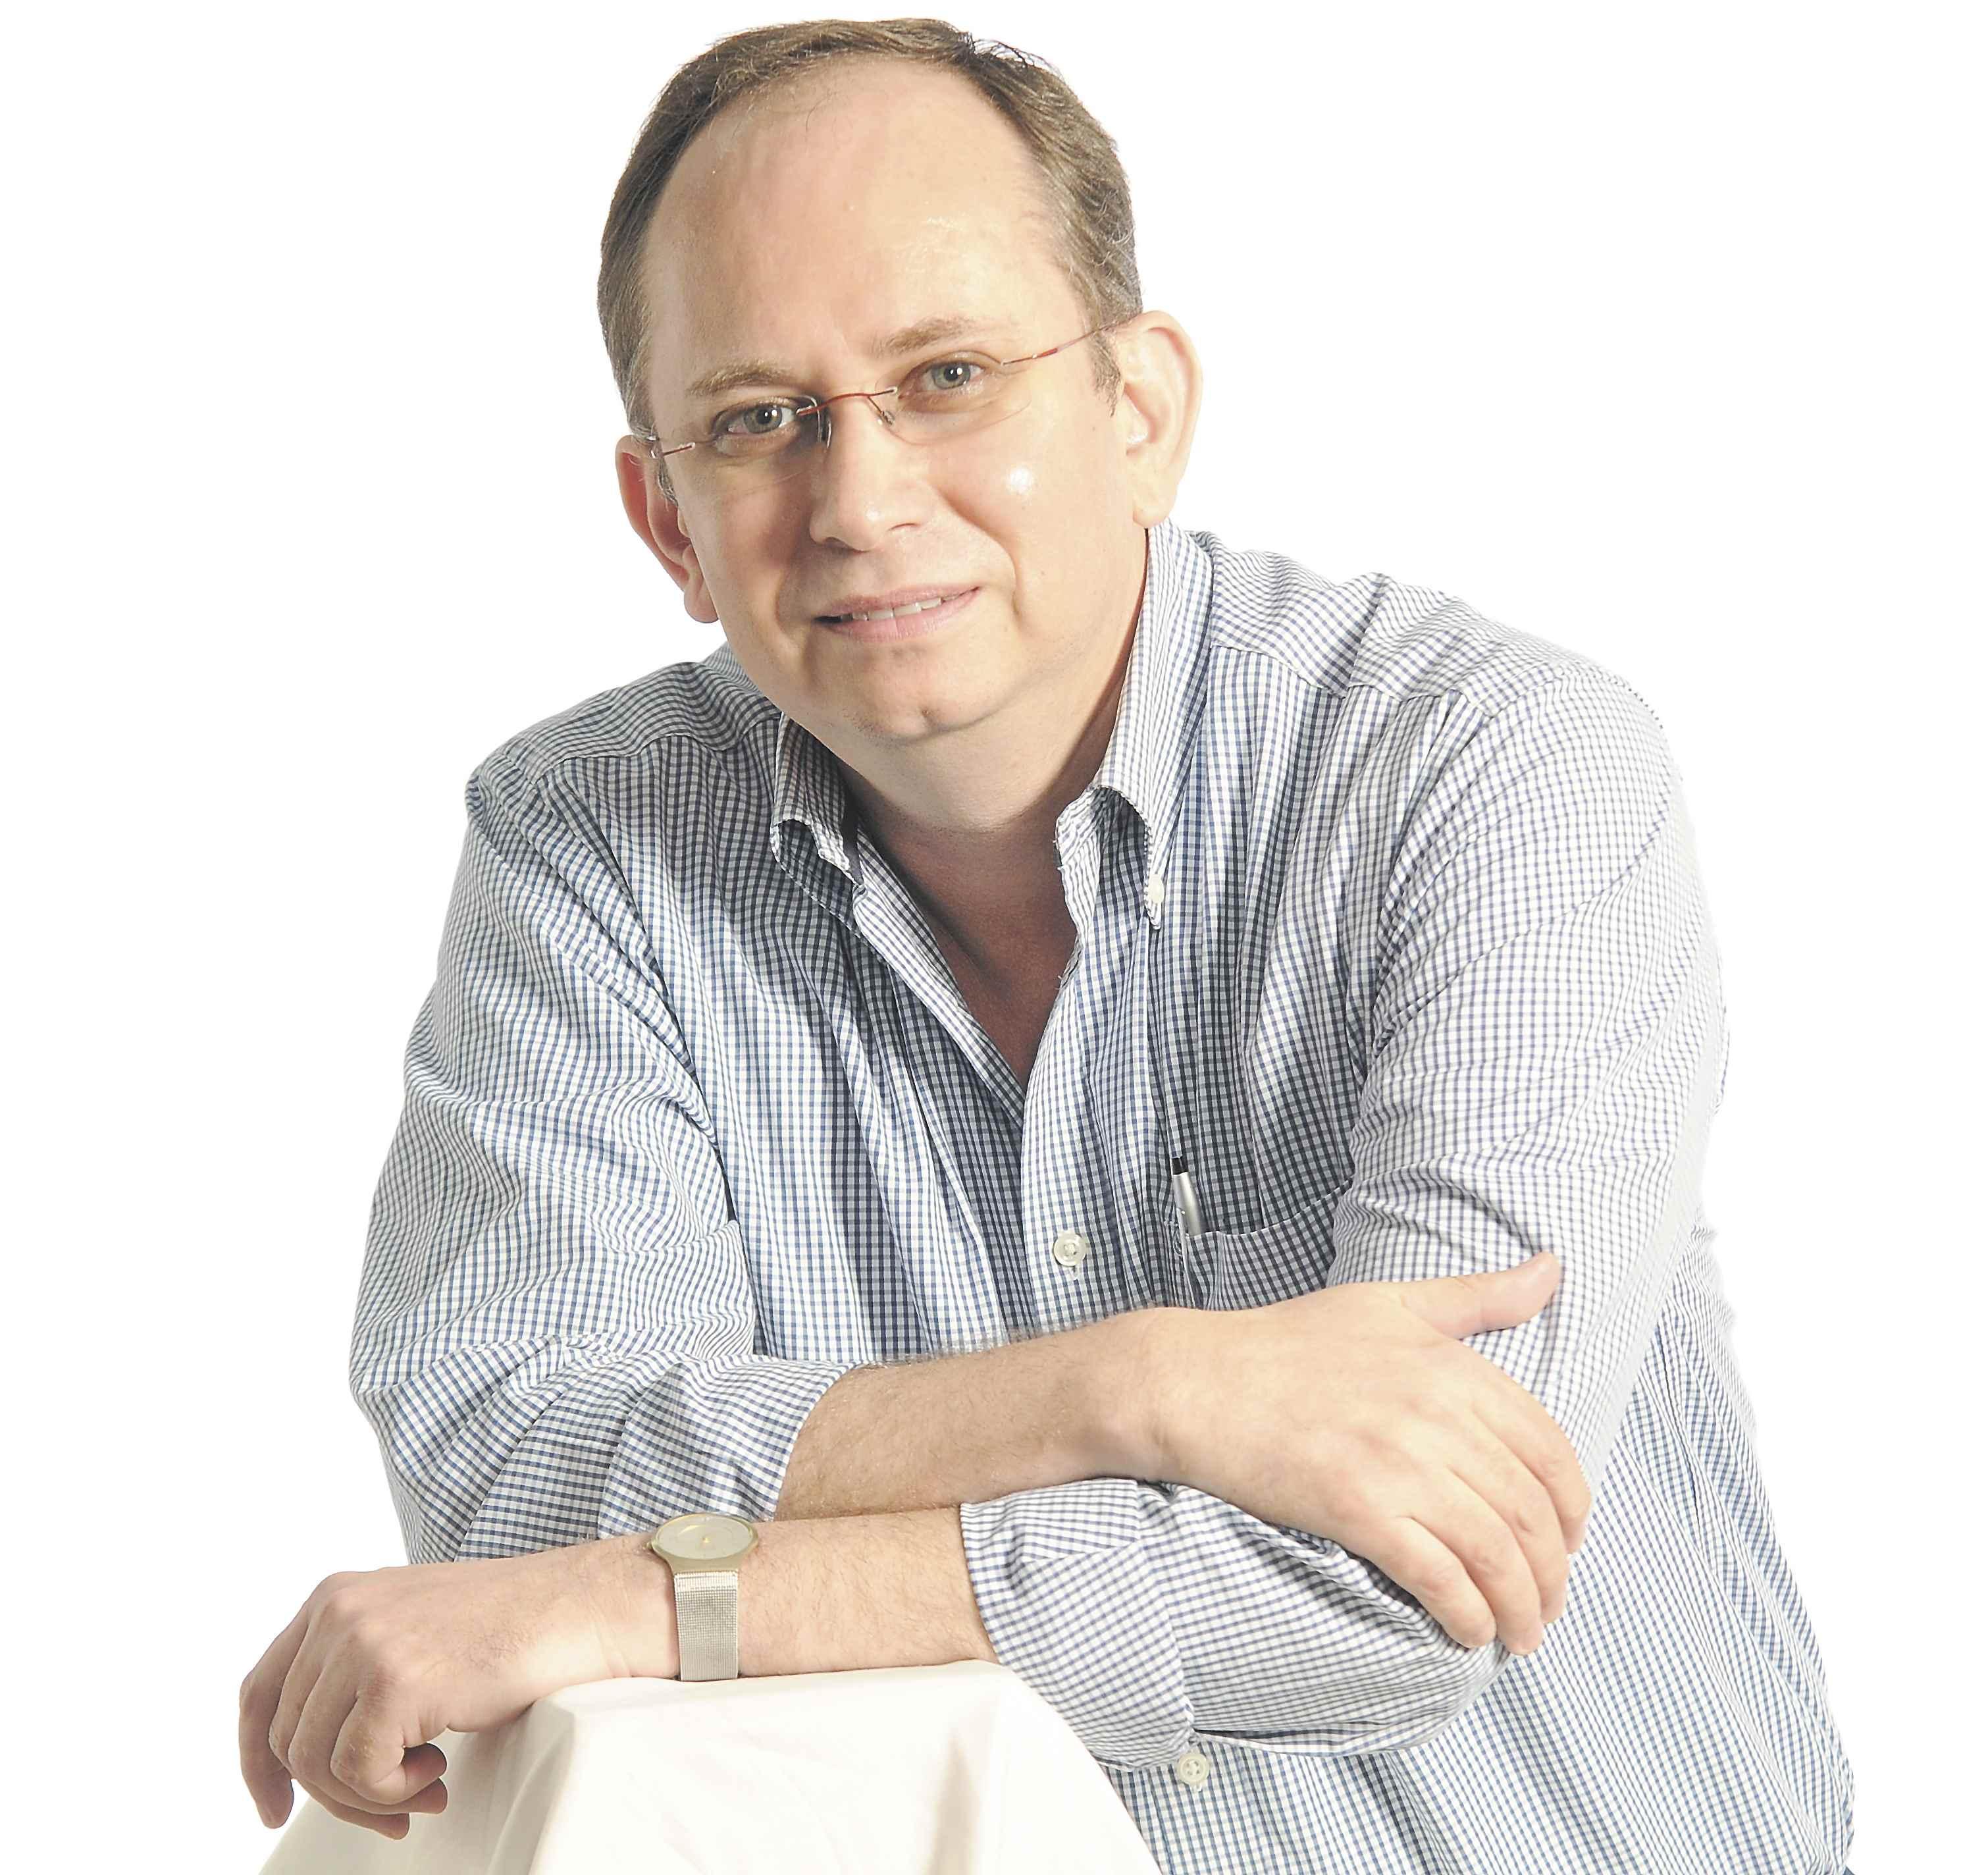 Fabian Medina